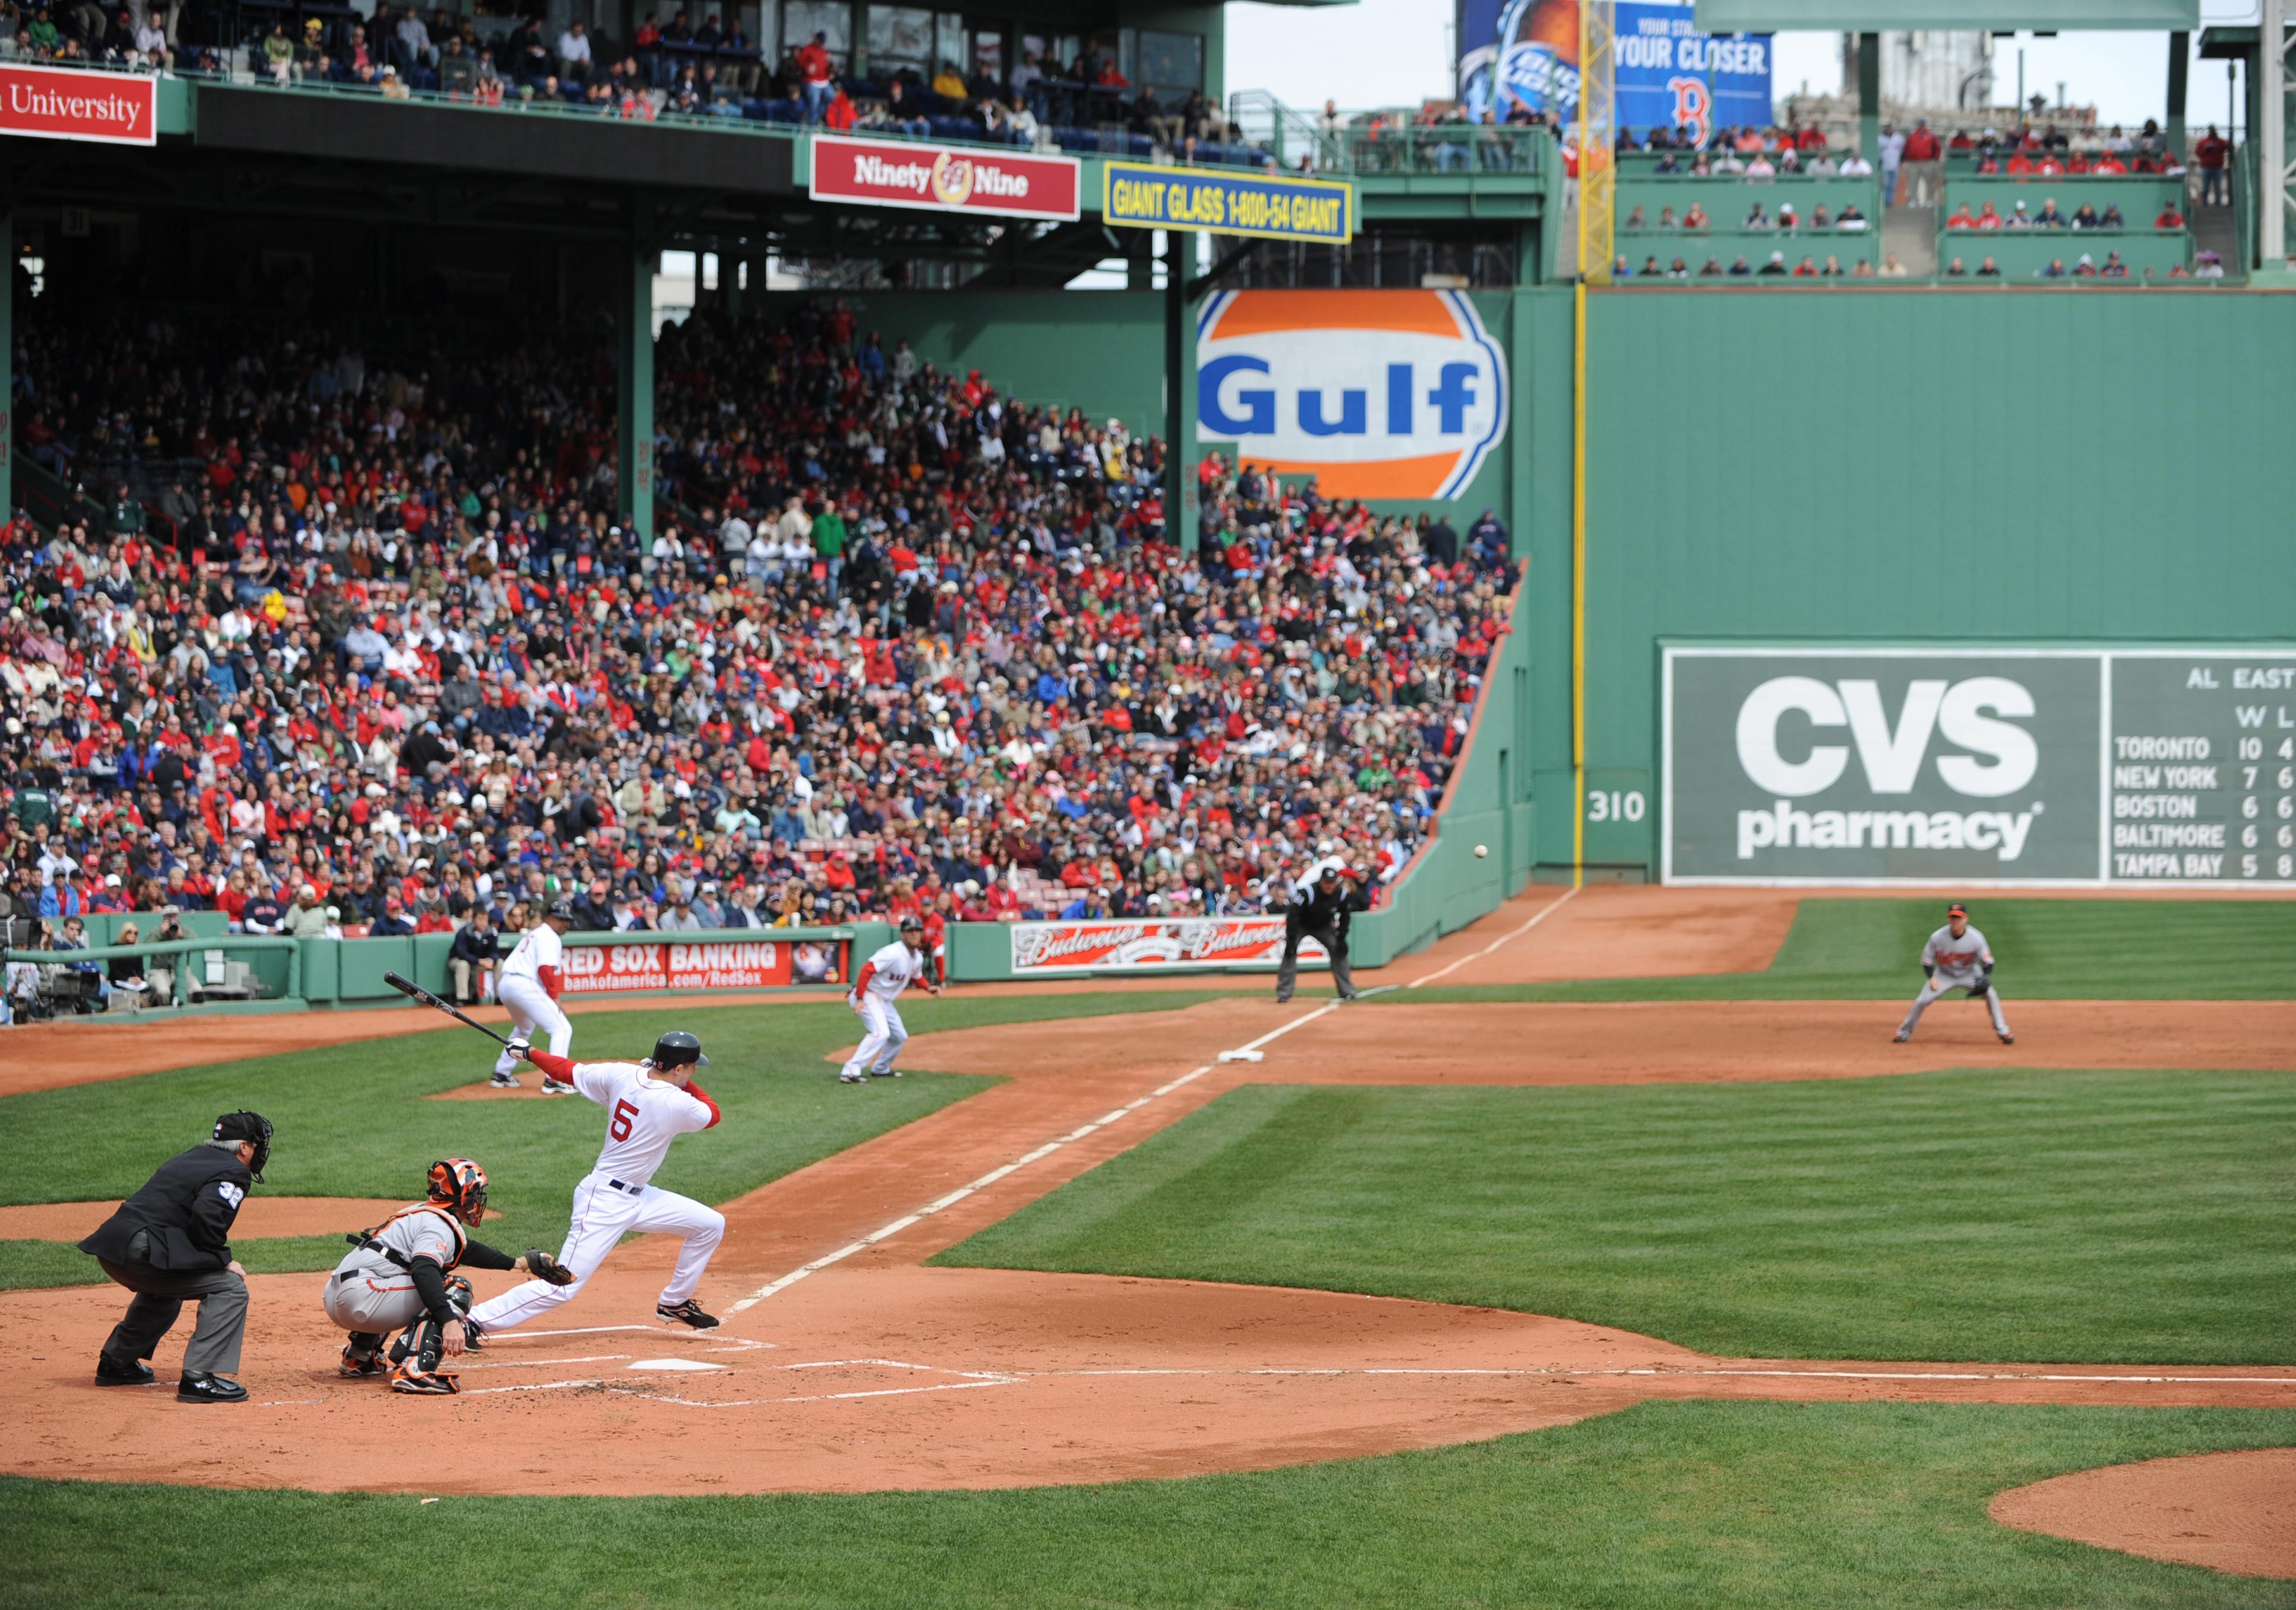 Red Sox Wallpaper HD 3880x2720